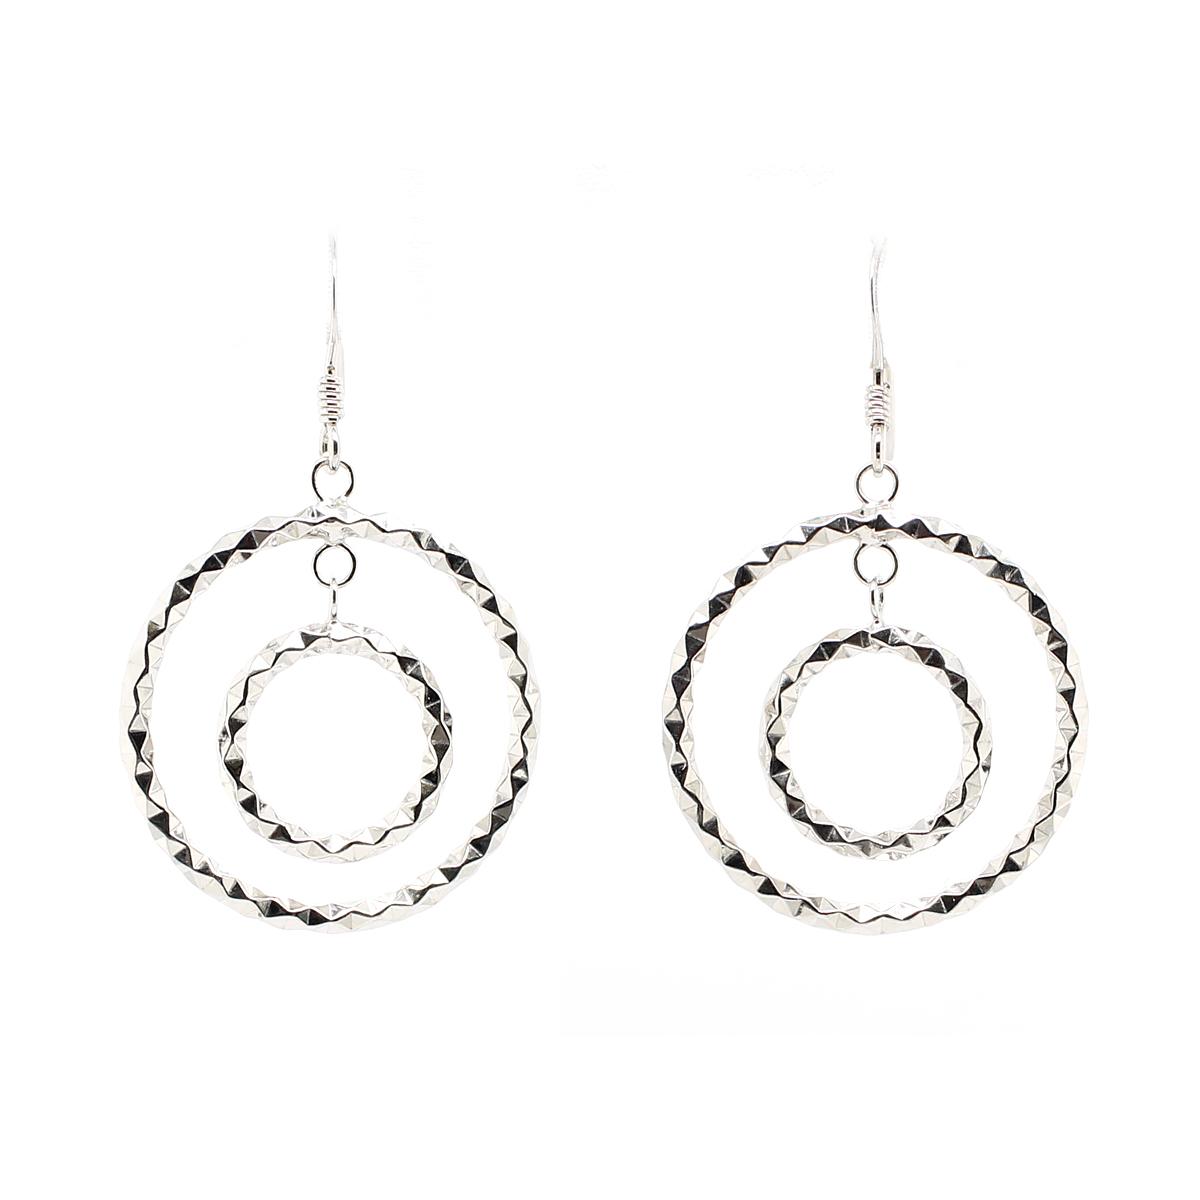 Royal Chain Sterling Silver Diamond Cut Circle Dangle Earrings